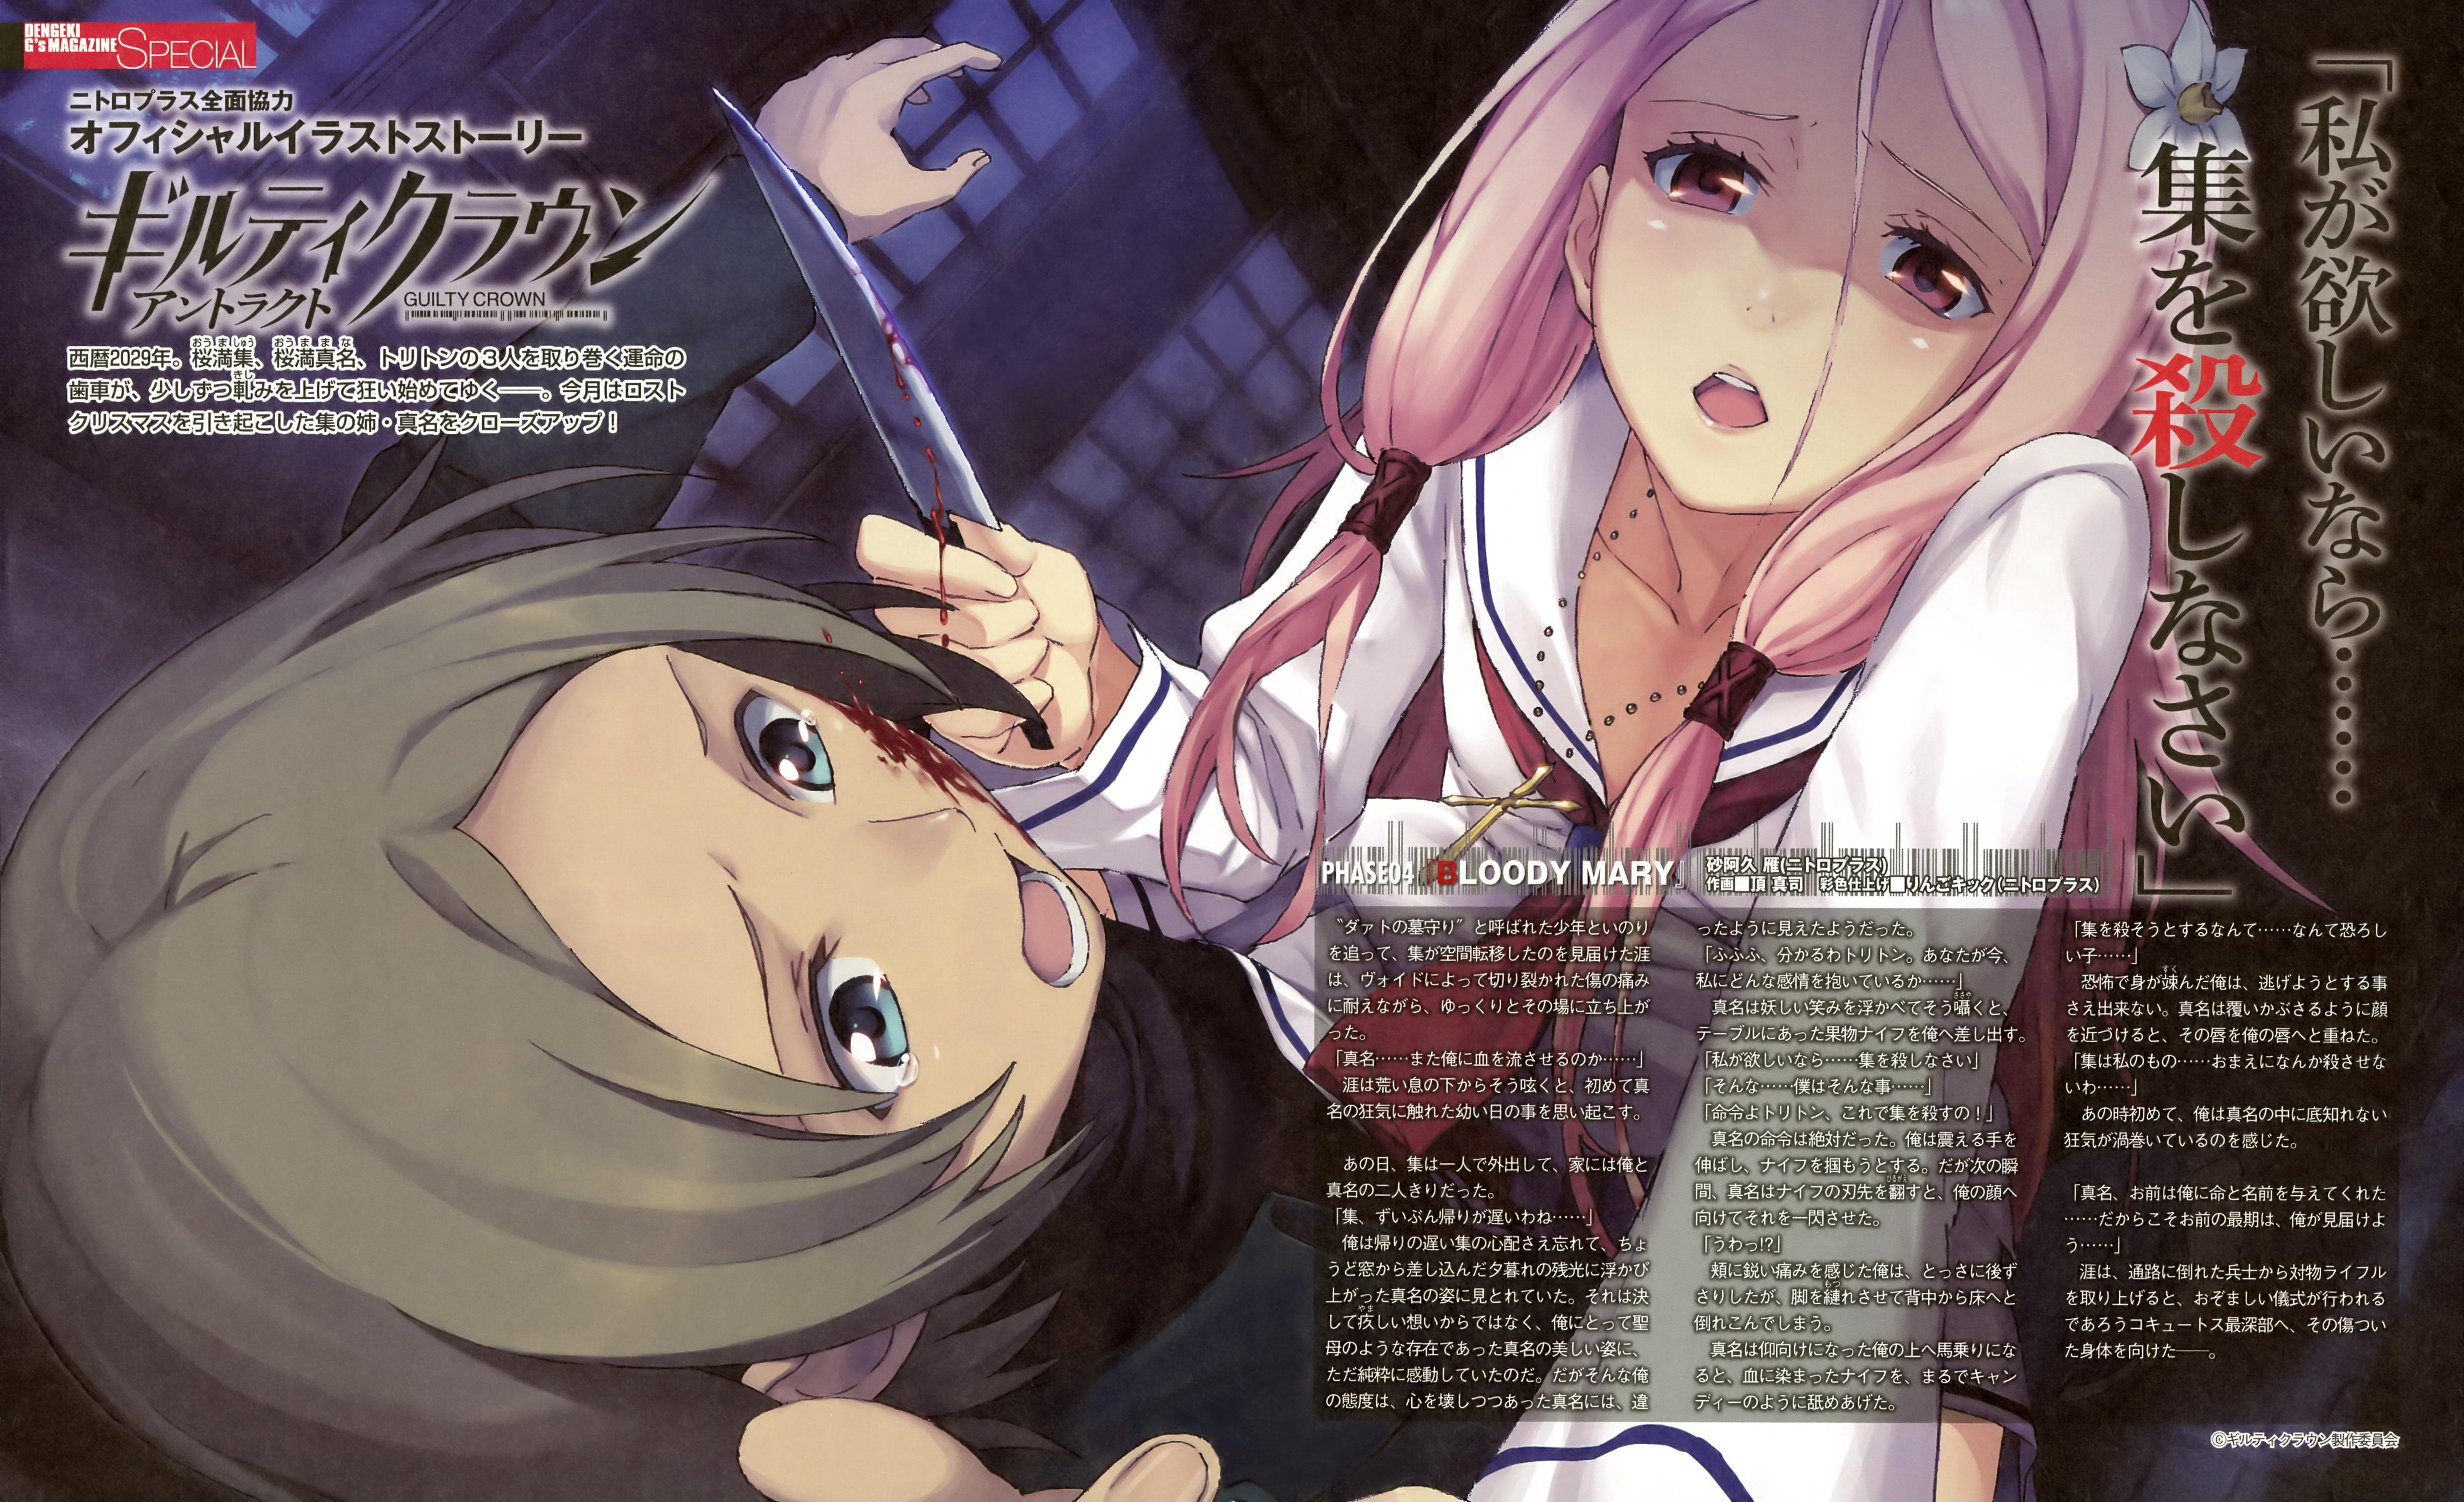 Tsutsugami Gai Wallpaper Zerochan Anime Image Board